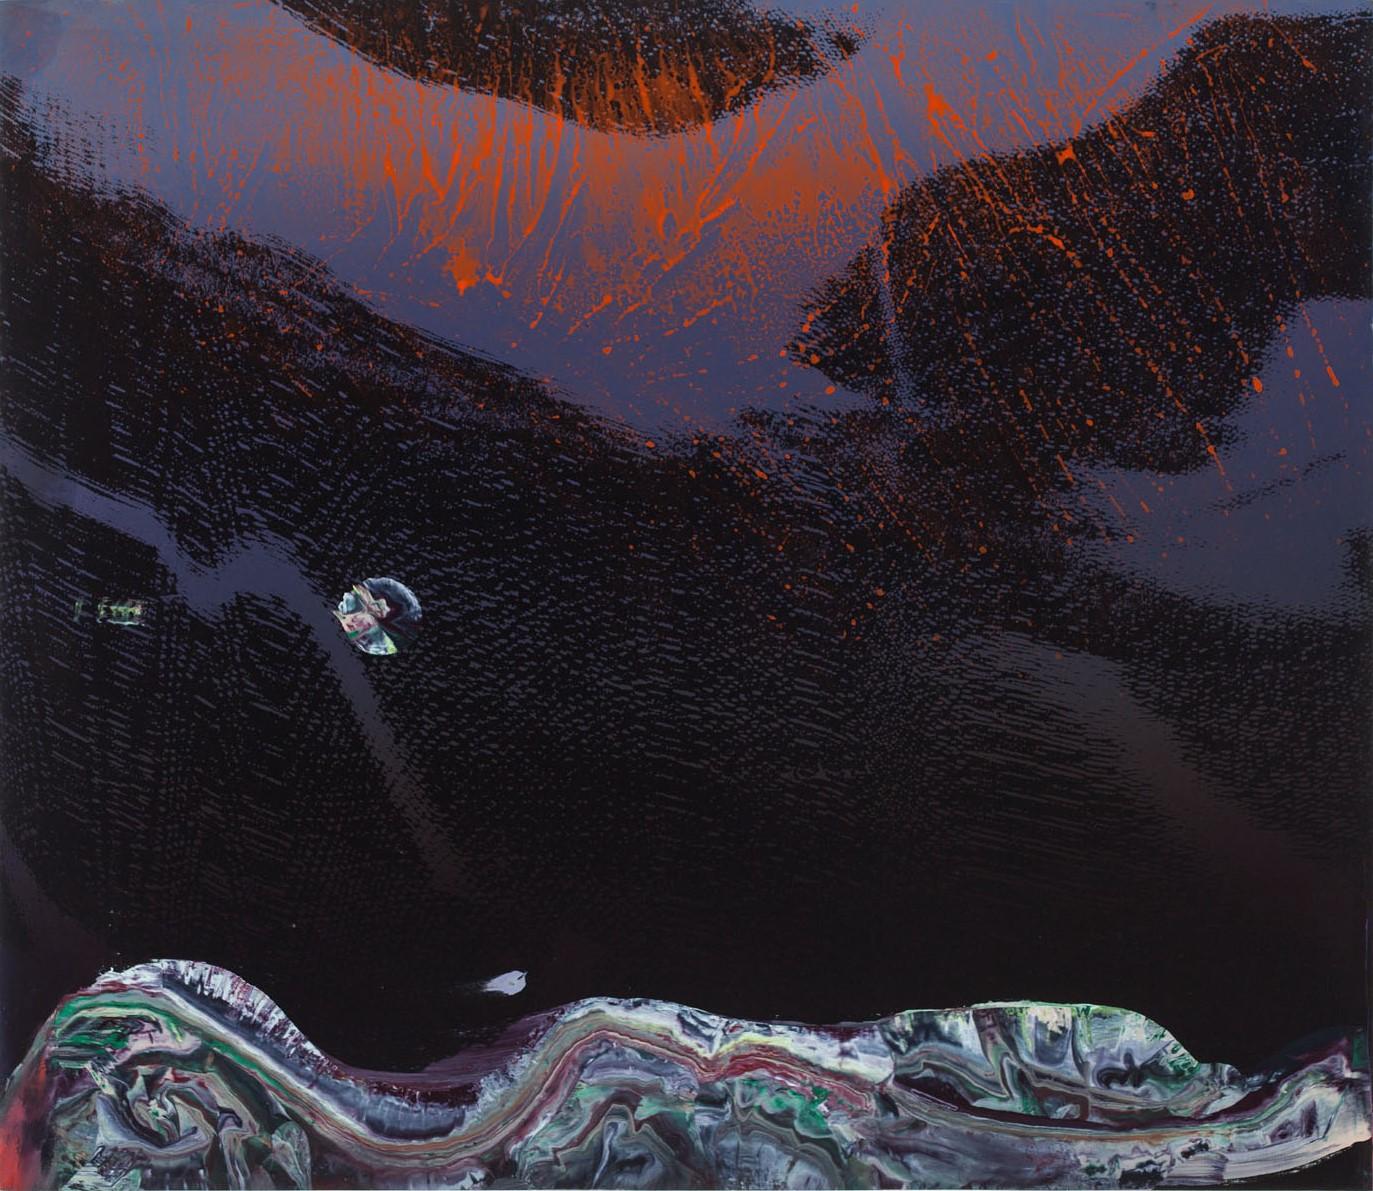 "EVA SPEER High Industry, 2012 Huile et sérigraphie sur panneau / oil and serigraphy on panel66.04 x 76.2 cm / 26"" x 30""USD $2,105 (avec encadrement / framed)"